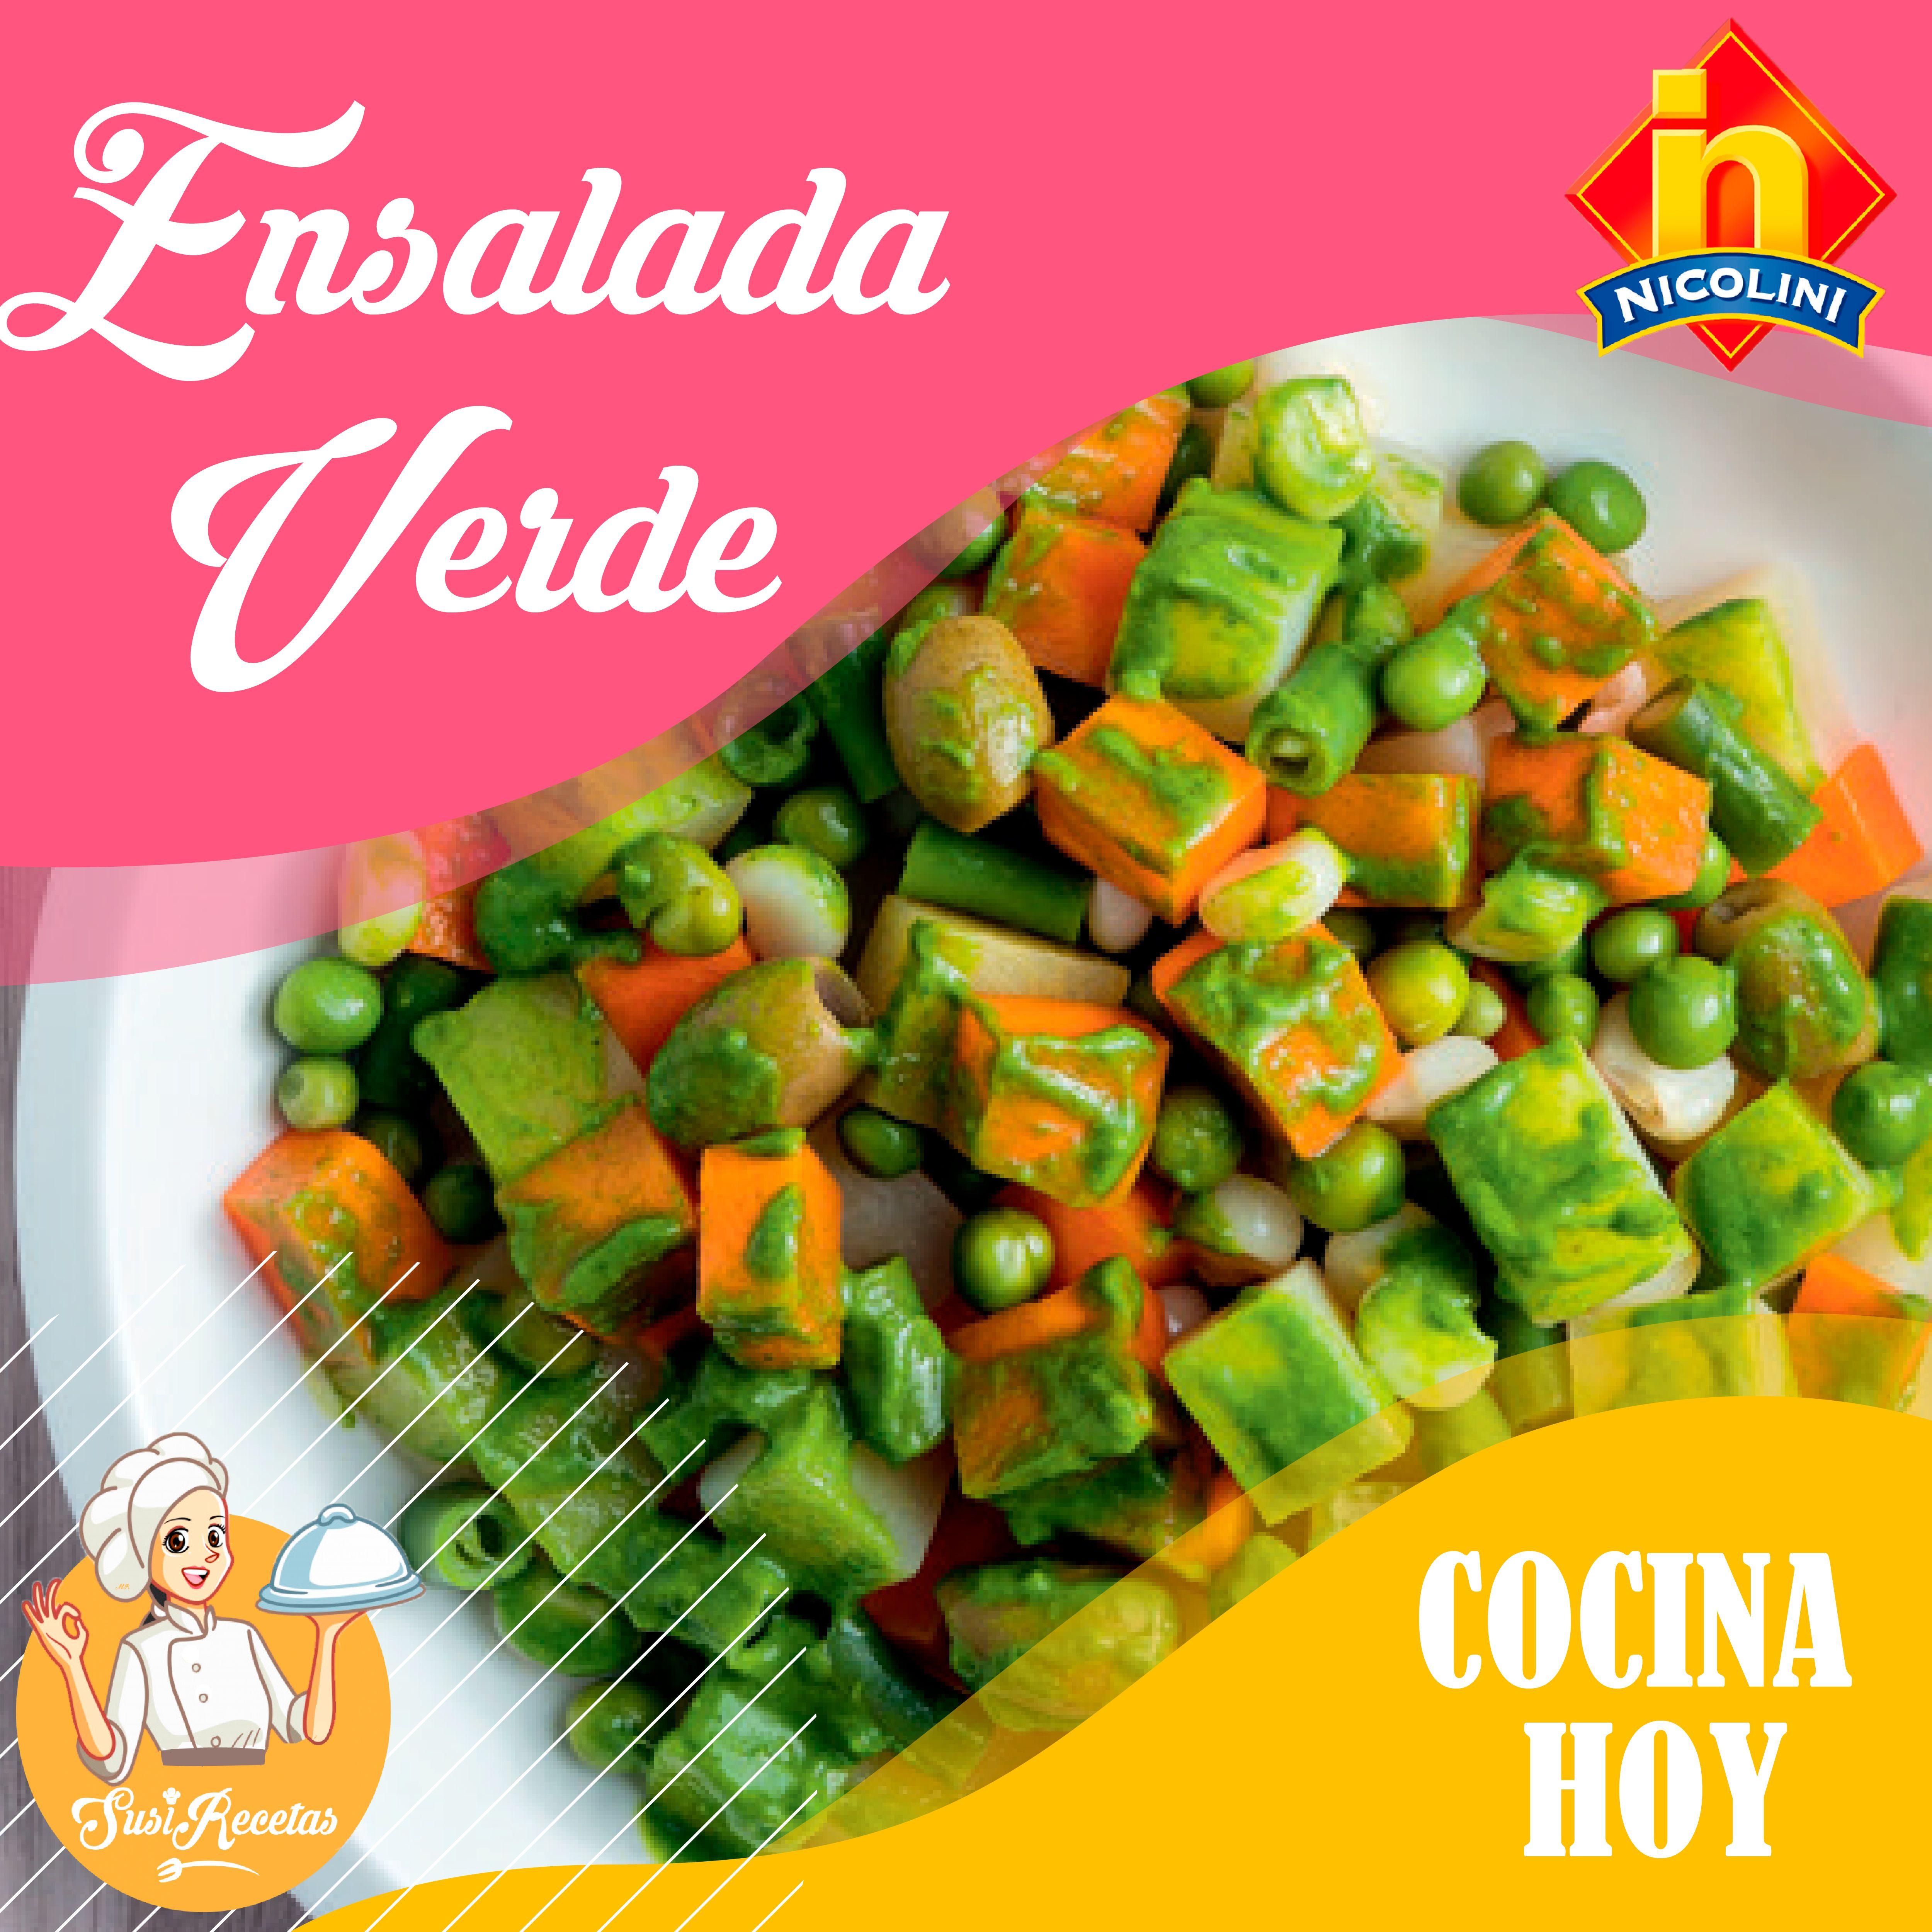 #maracaibo #venezuela #pizza #postres #coffeetime #tag #like👍✅ #coment💬✅ #sezar #havalini #salad #cafe #pastas #delicious #desayunos #pasticho #mcbo #naguanagua #pizzalovers #invita #pizzeria #coffee #vitacafemcbo #300gradipizzeros #valencia #ujap #uam #uc #hamburguesas #italianfood